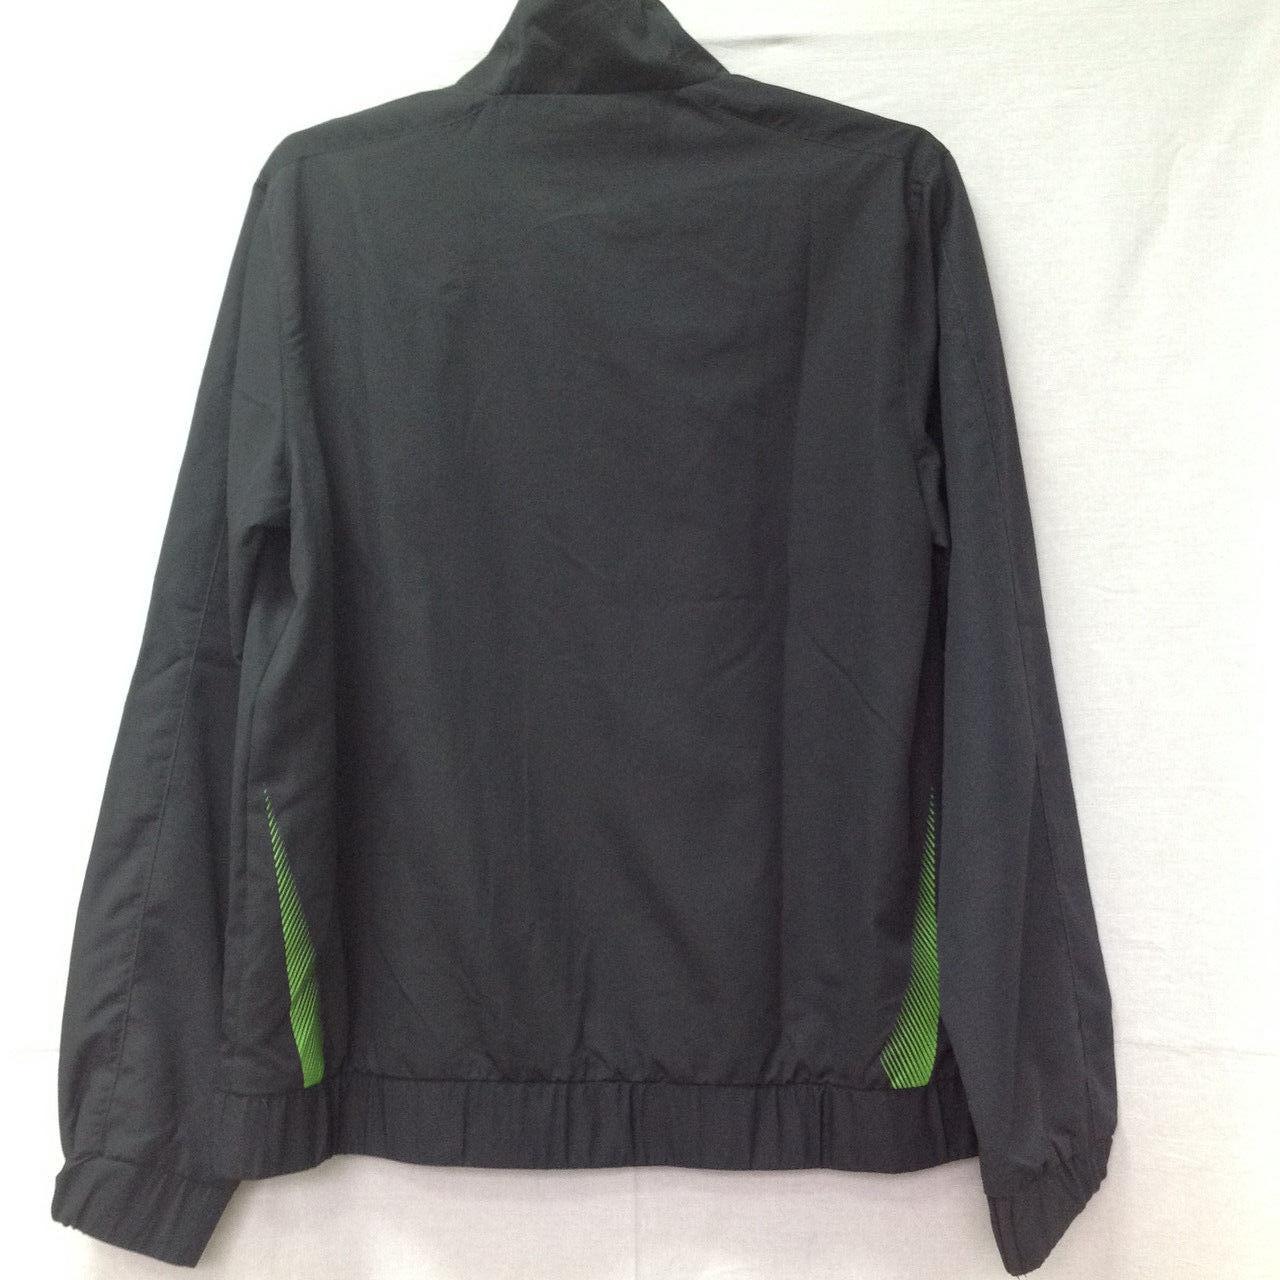 00b35e5d Мужской спортивный костюм Reebok Ripstopvector Regular Fit.: продажа ...